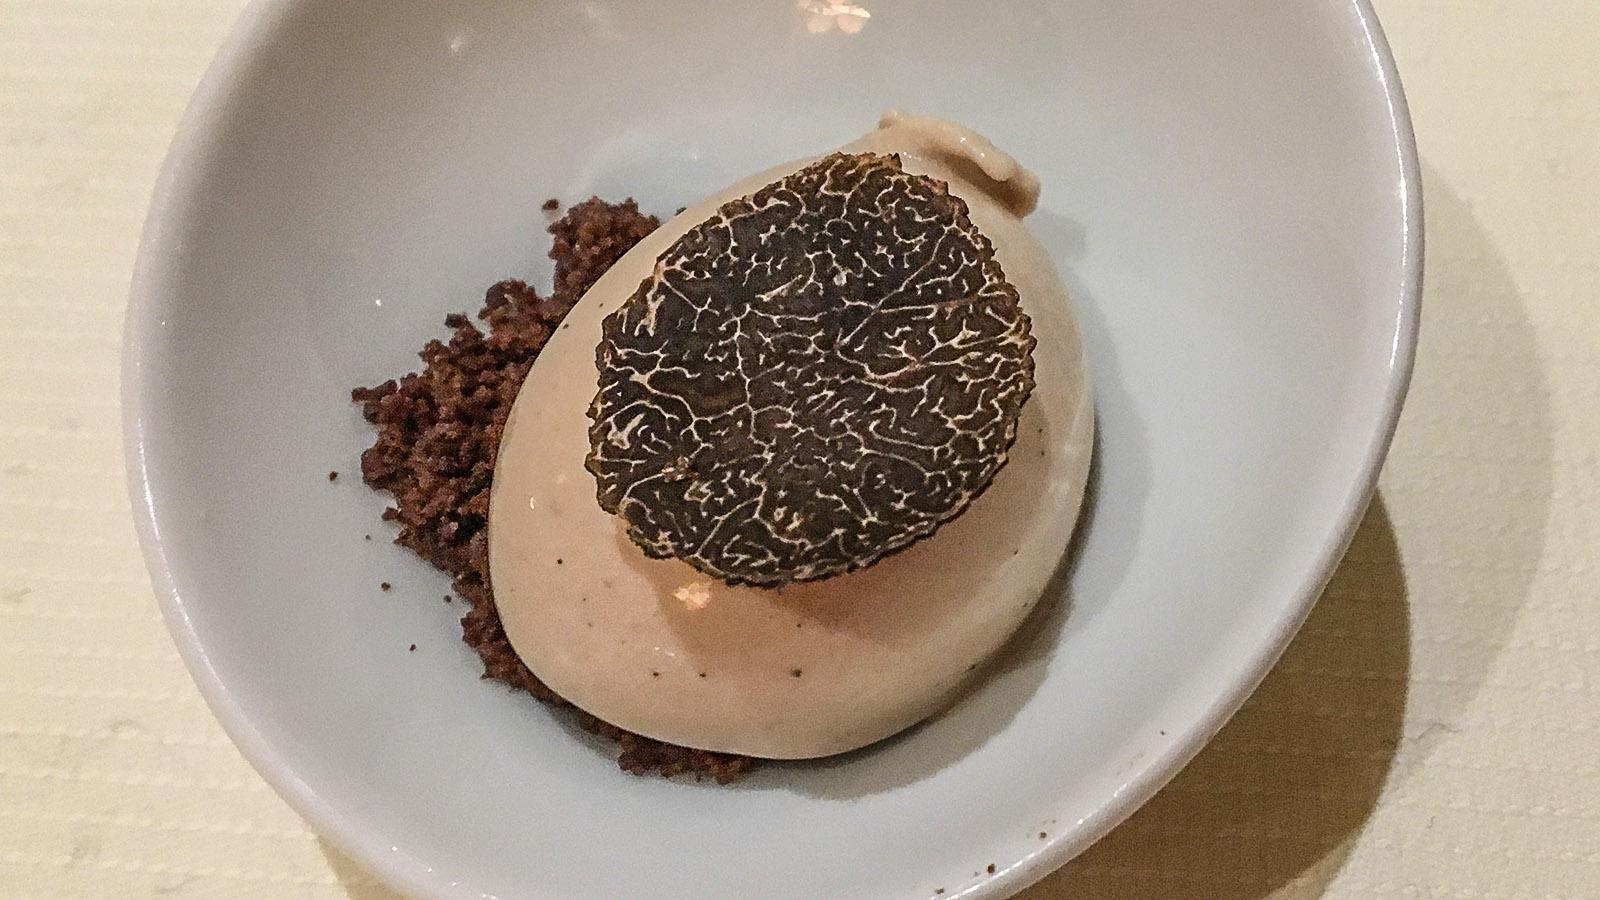 Bruno Chartron: Pré dessert marron truffé. Foto: Hilke Maunder